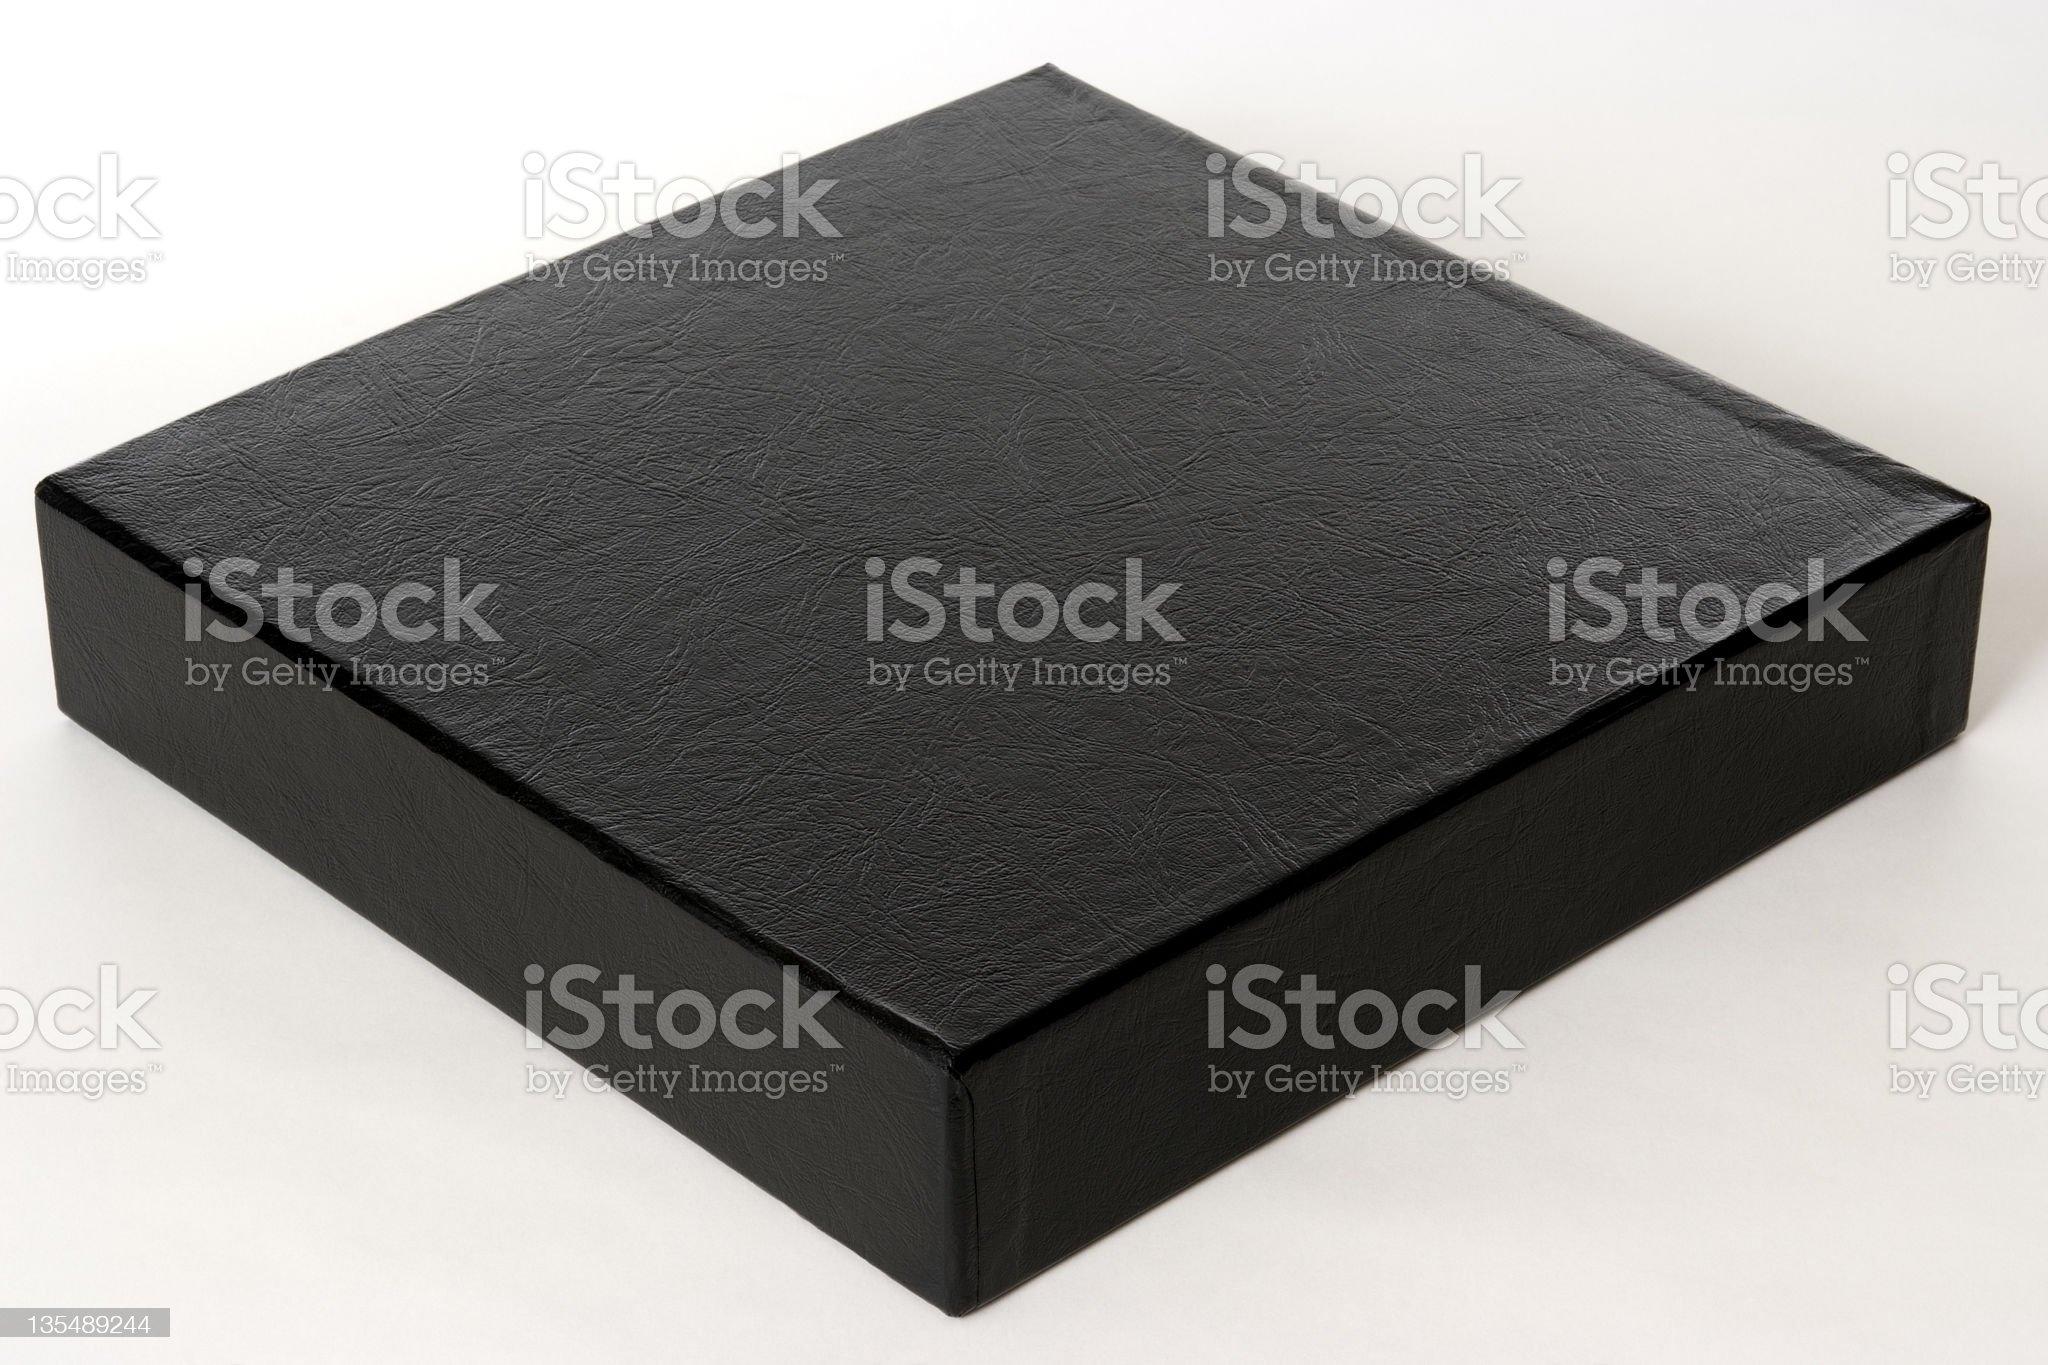 Isolated shot of blank black box on white background royalty-free stock photo